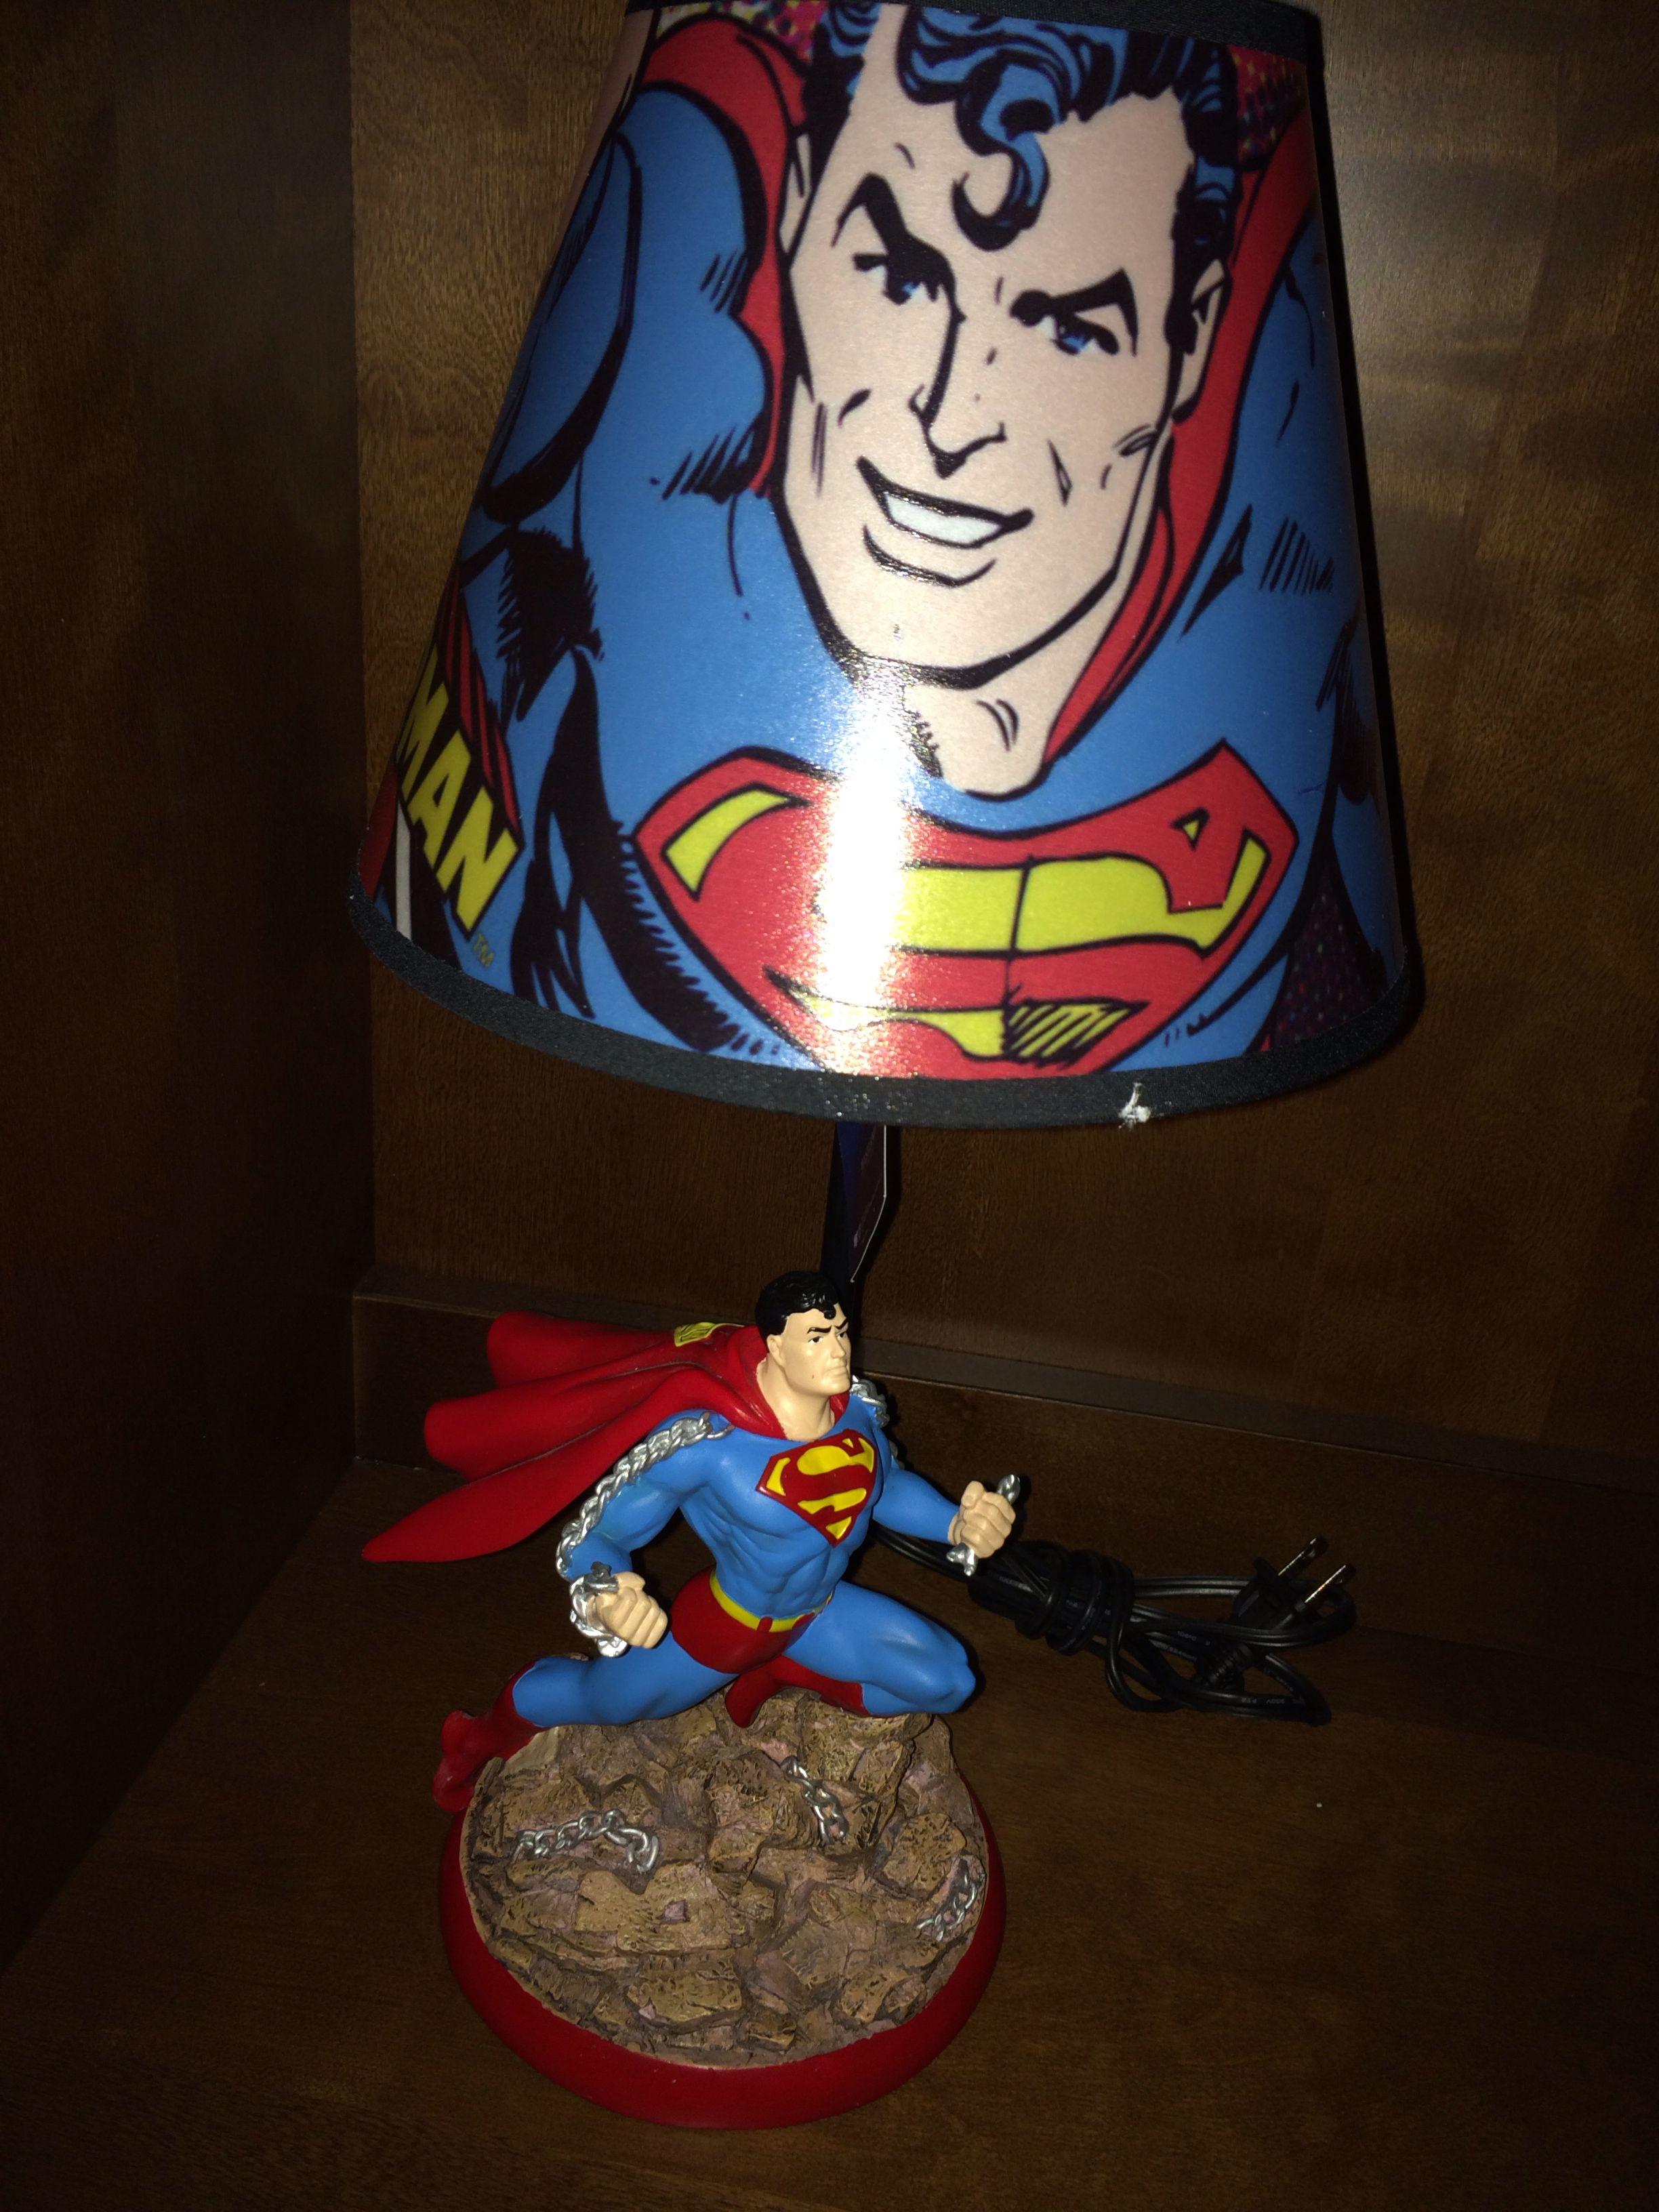 Superhero Room Design: Superman Lamp For The Superhero Room Is A Must